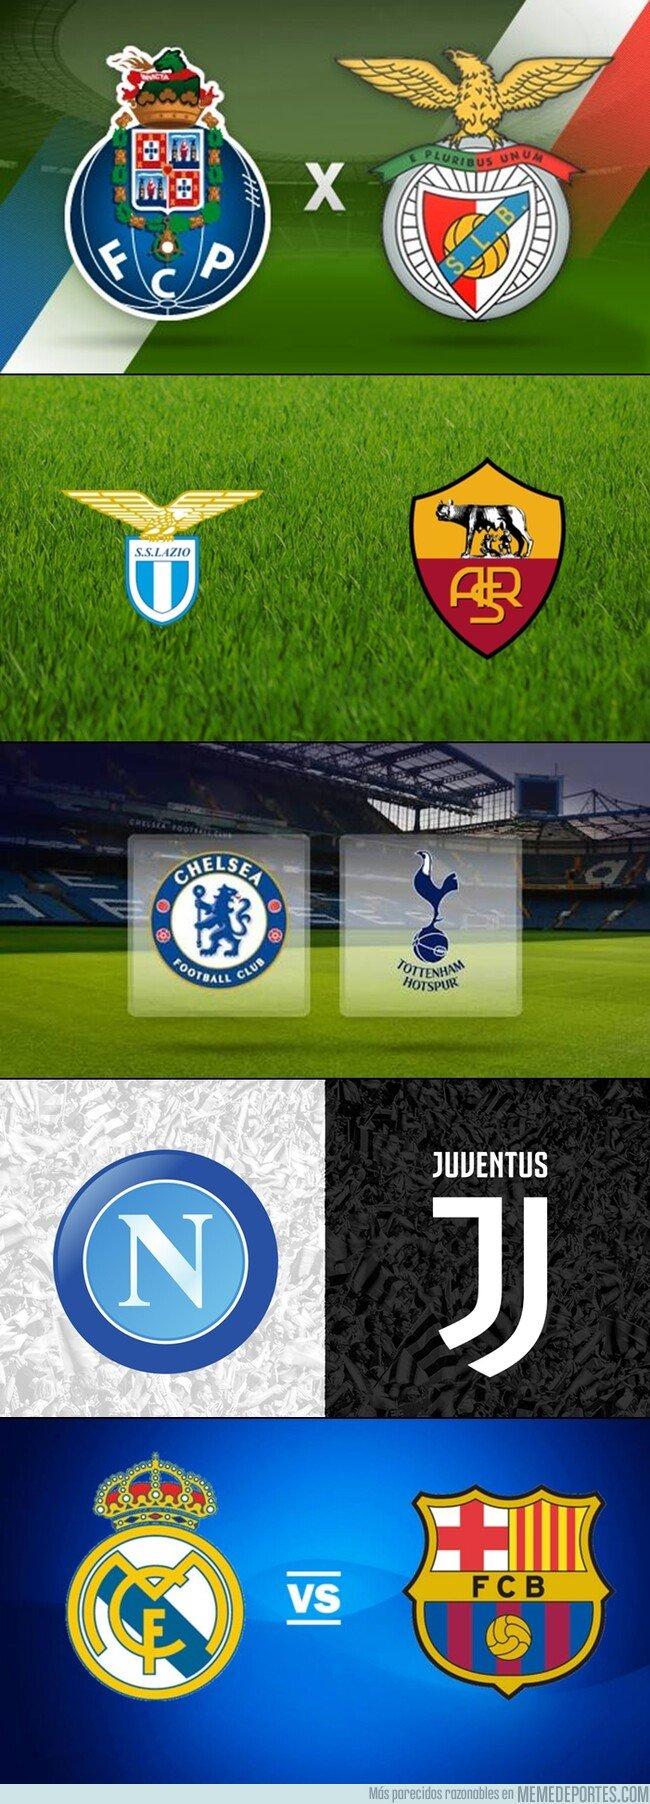 1065519 - Que se prepare Europa para la próxima jornada de ligas